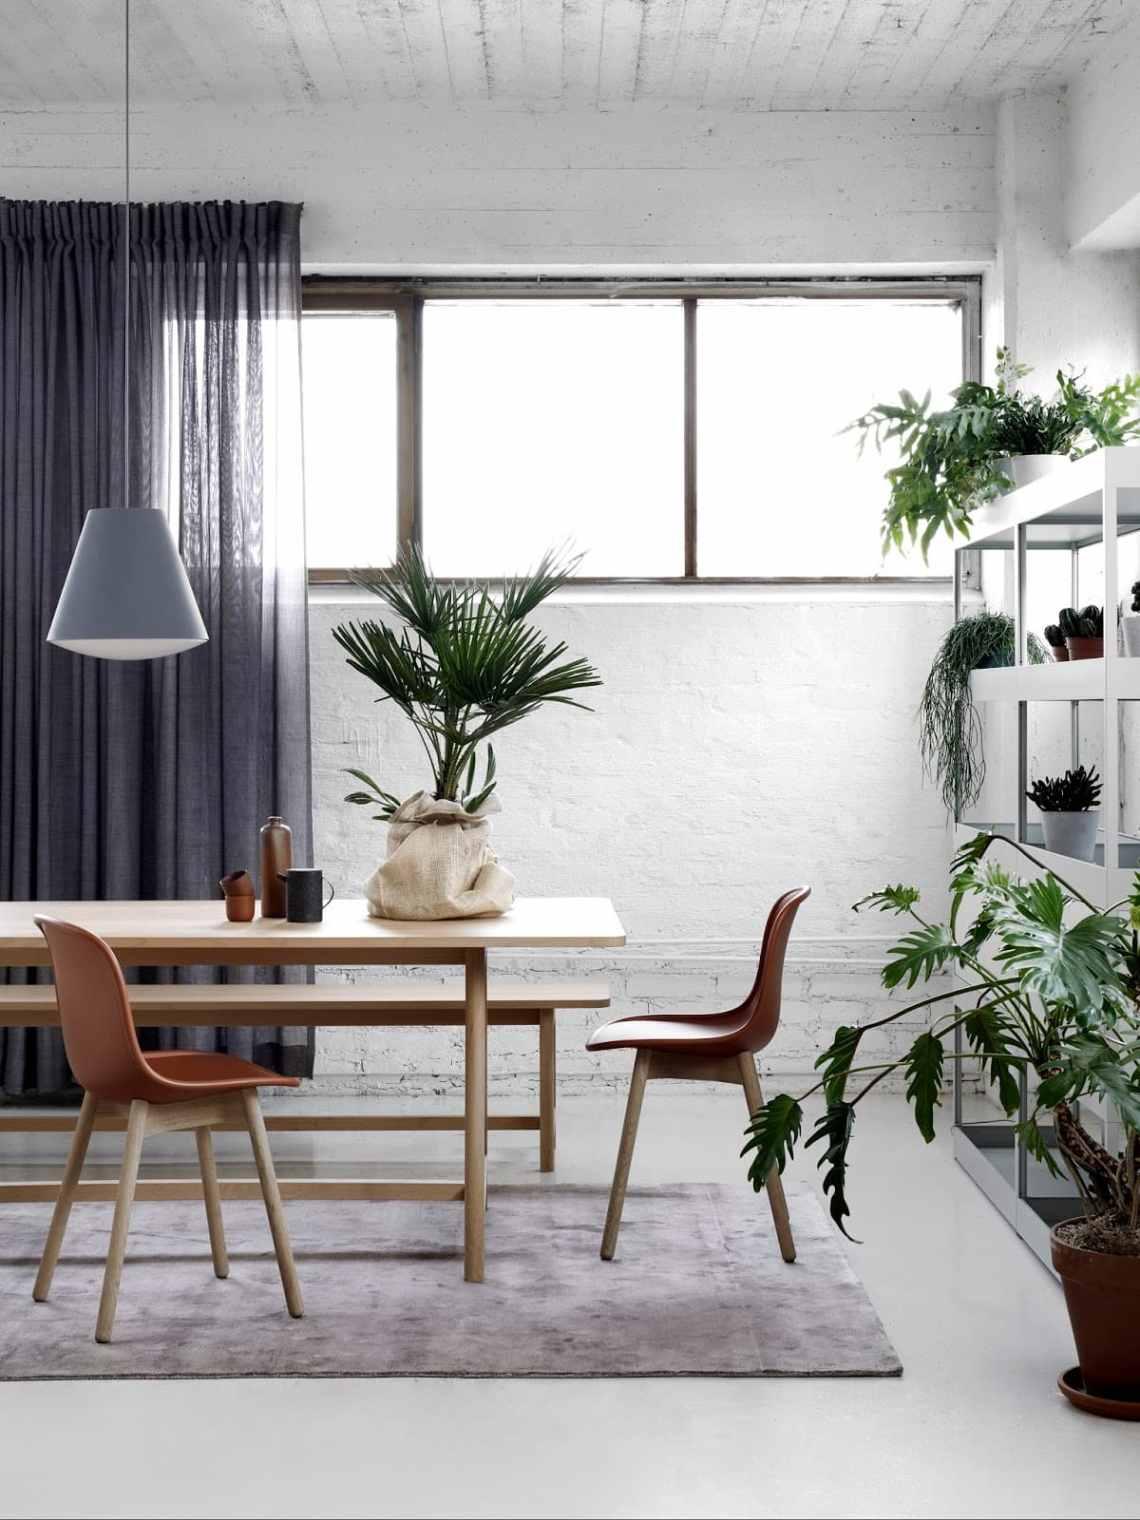 Riikka and Susanna's work - via cocolapinedesign.com